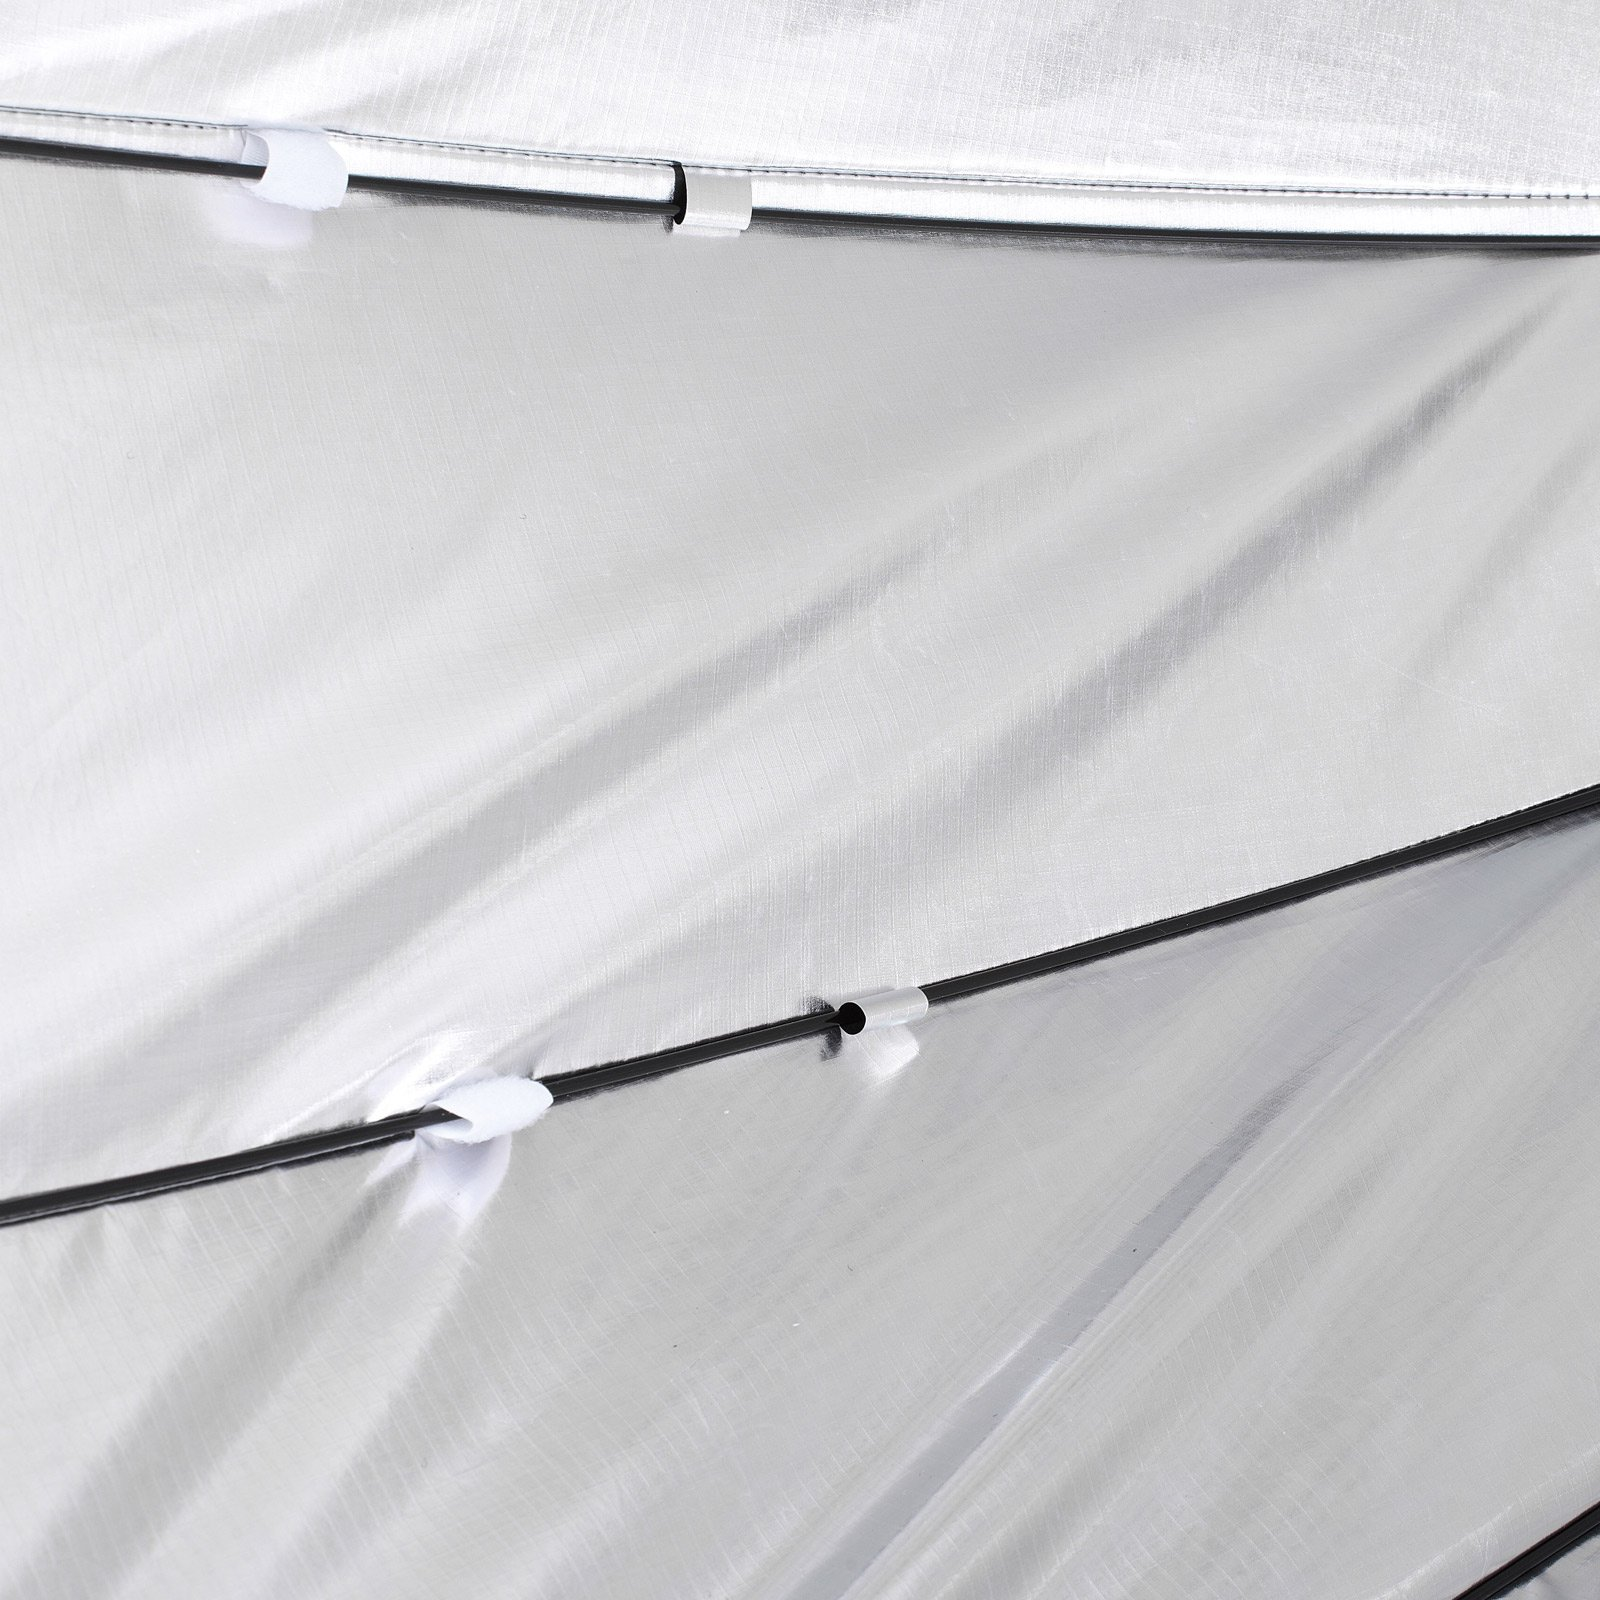 16 Rod Octagon Grid: Selens 48 Inch 16 Rods Portable Umbrella Brolly